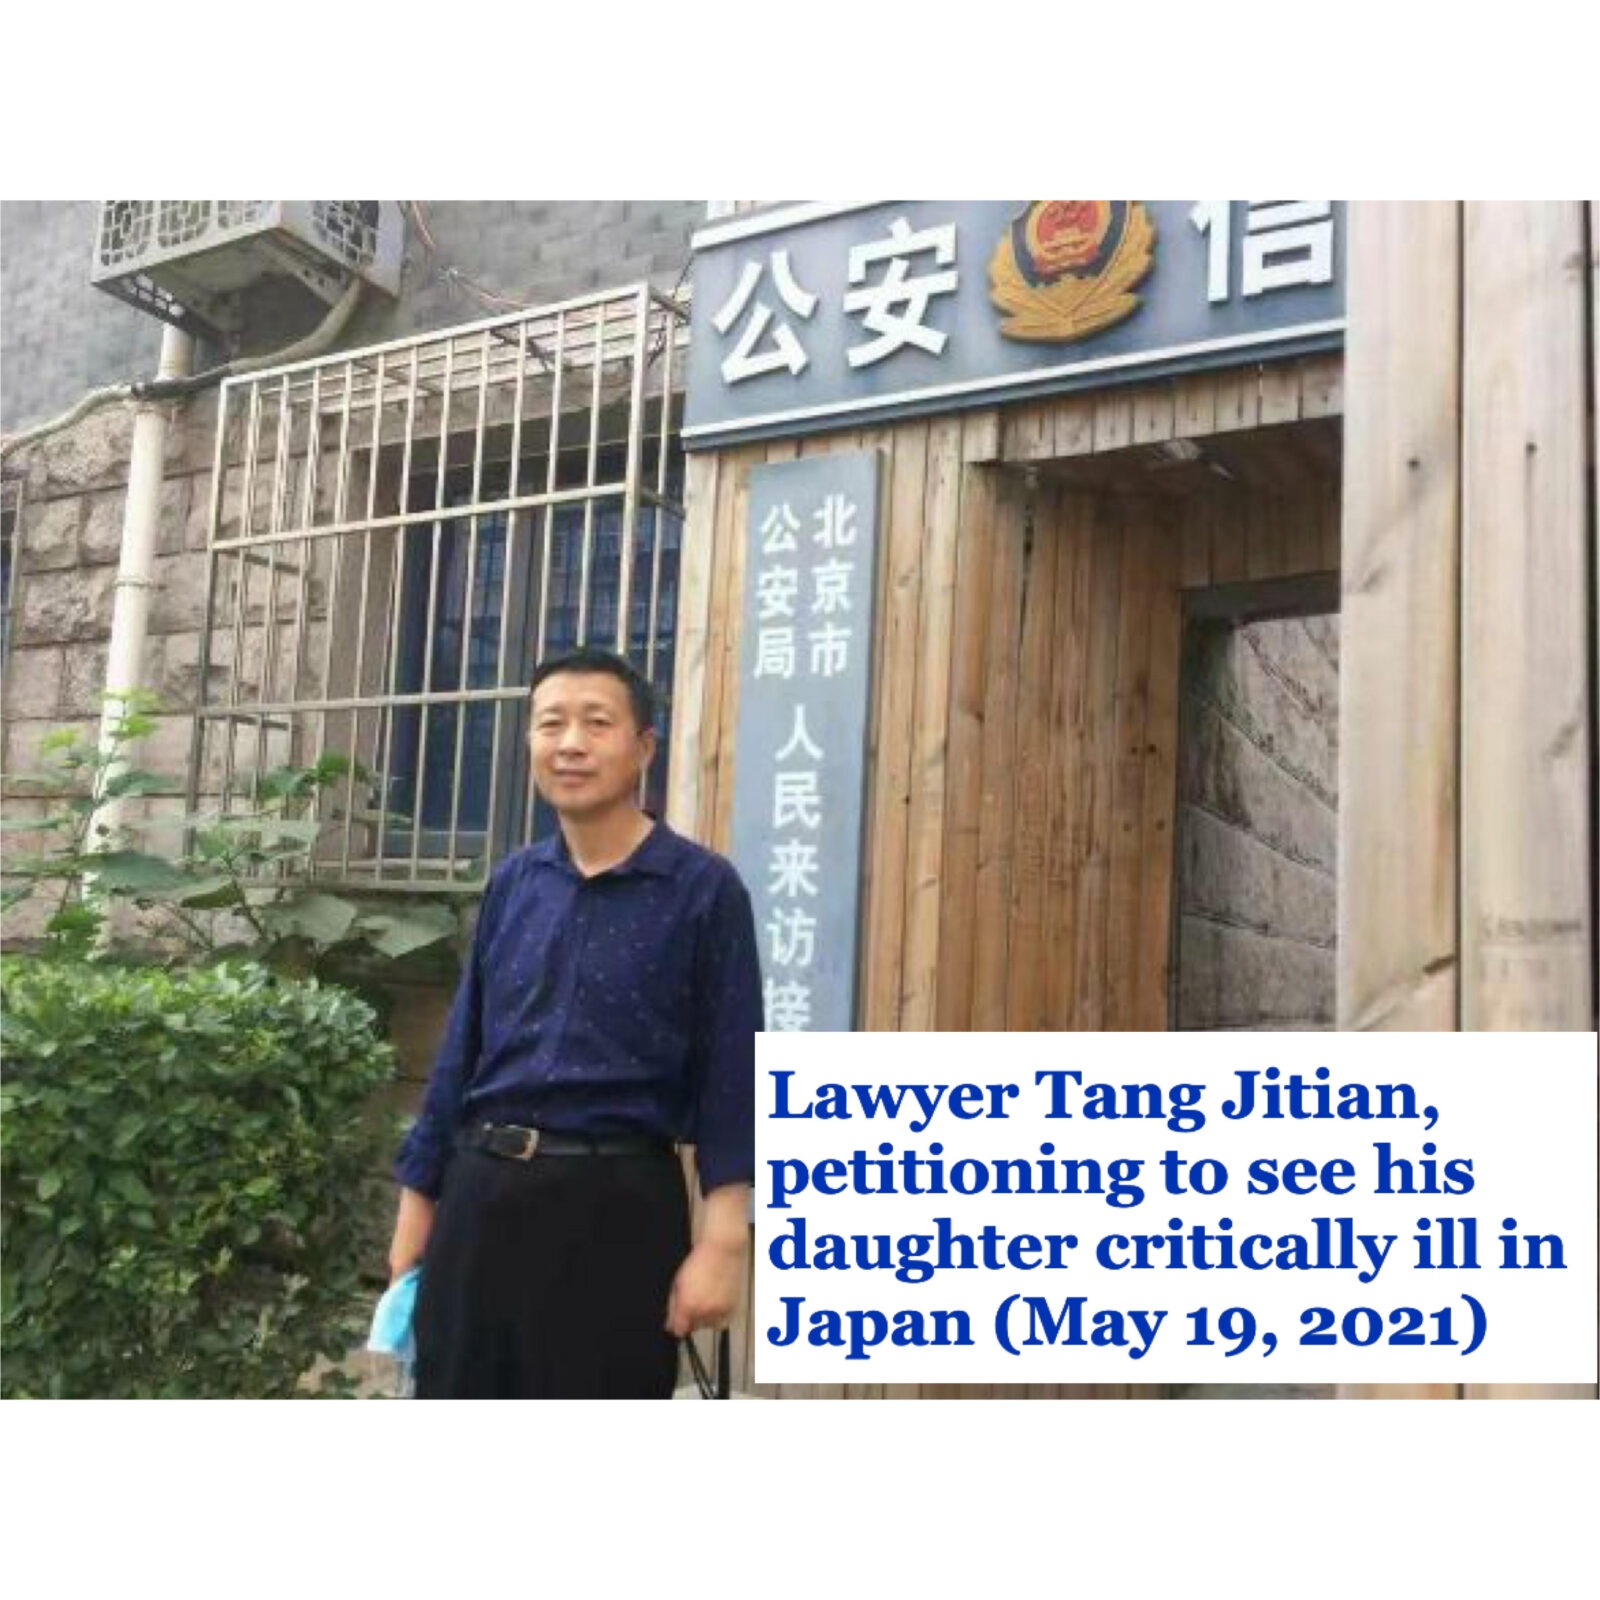 An appeal on behalf of lawyer Tang Jitian